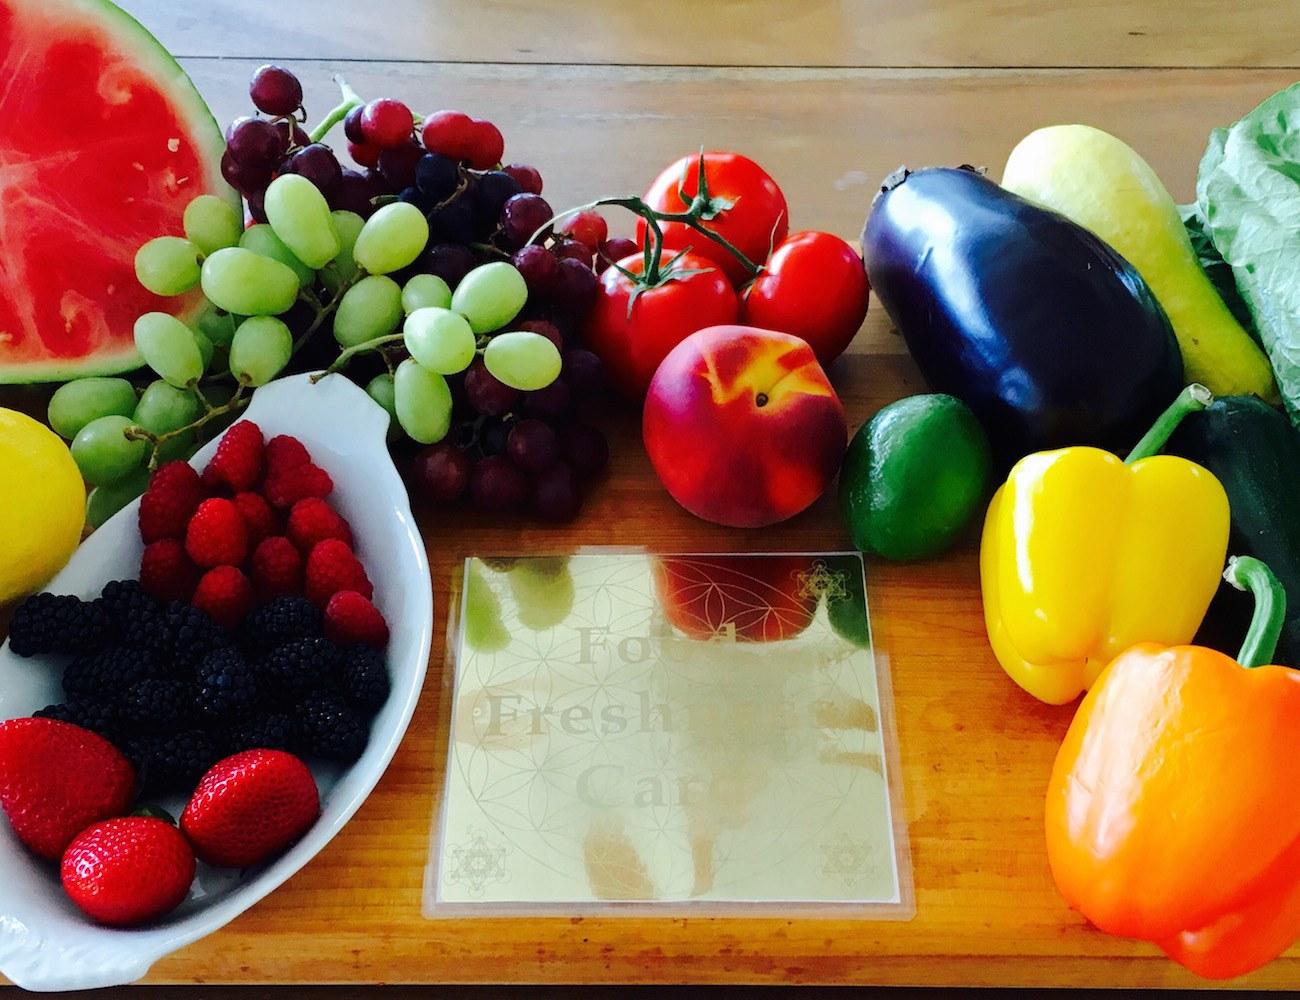 FOOD FRESHNESS CARD – Keeps Your Food Fresher Longer